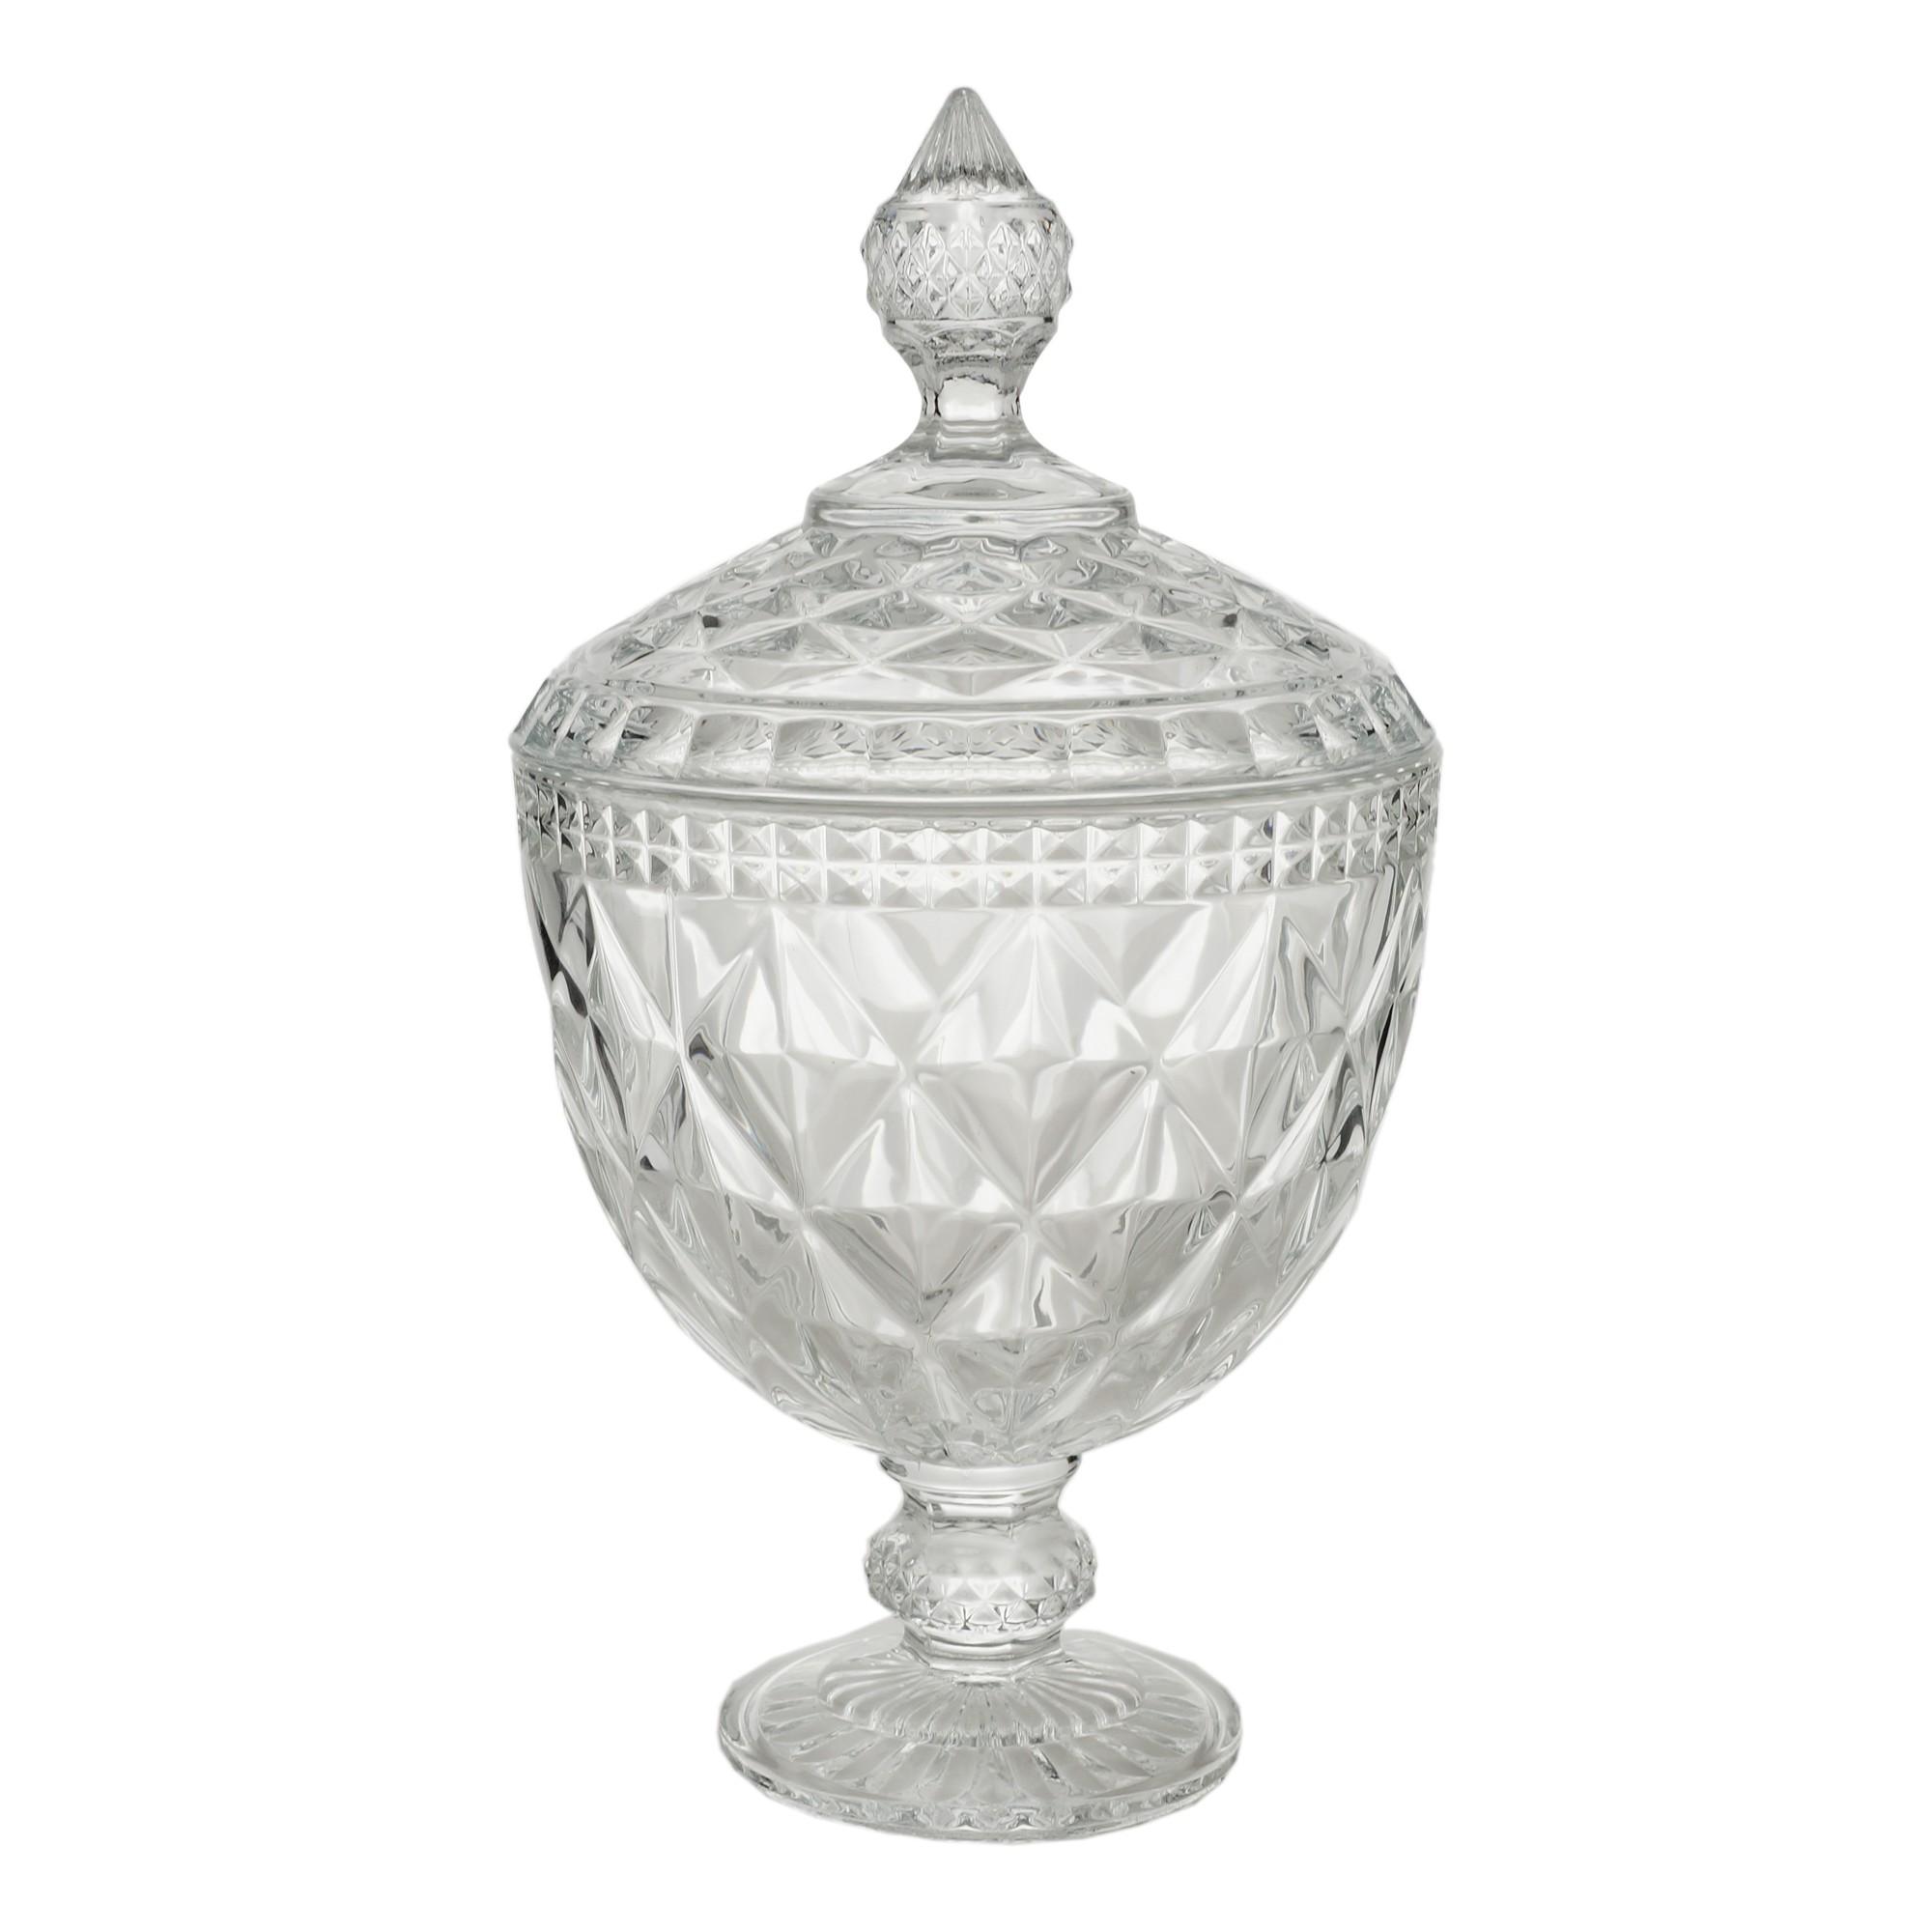 Bomboniere Cristal 28cm Diamond Transparente 7767 - Lyor Decor